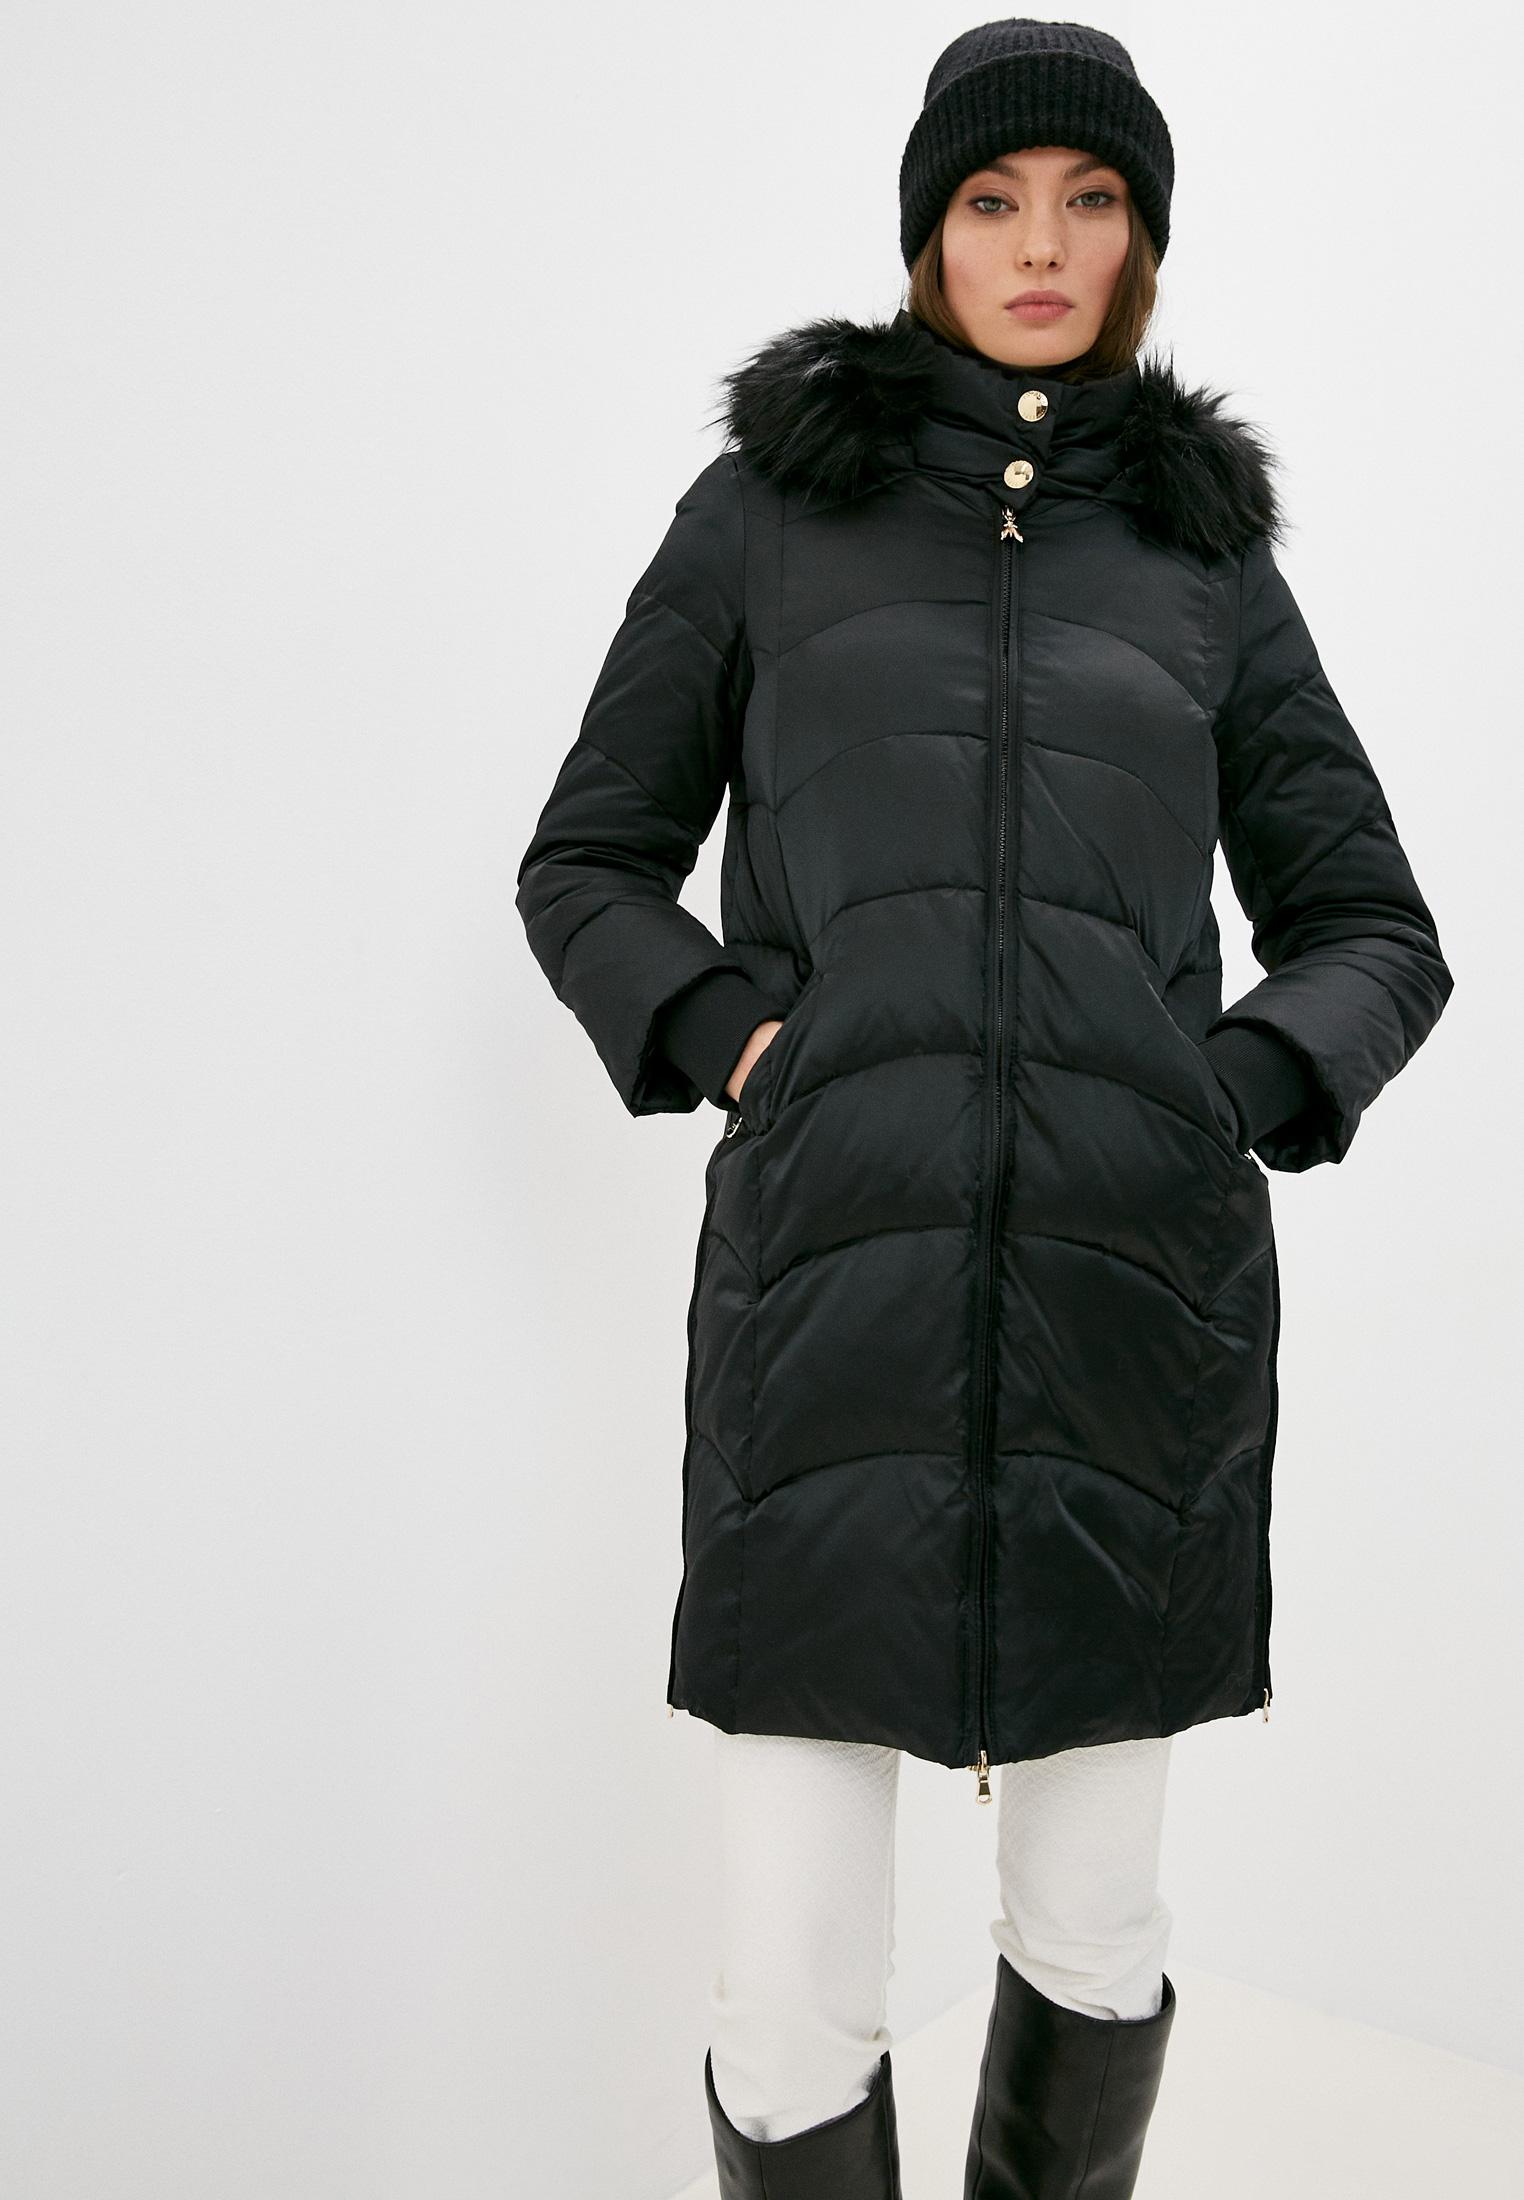 Утепленная куртка Patrizia Pepe (Патриция Пепе) 2S1215 AR78A K103